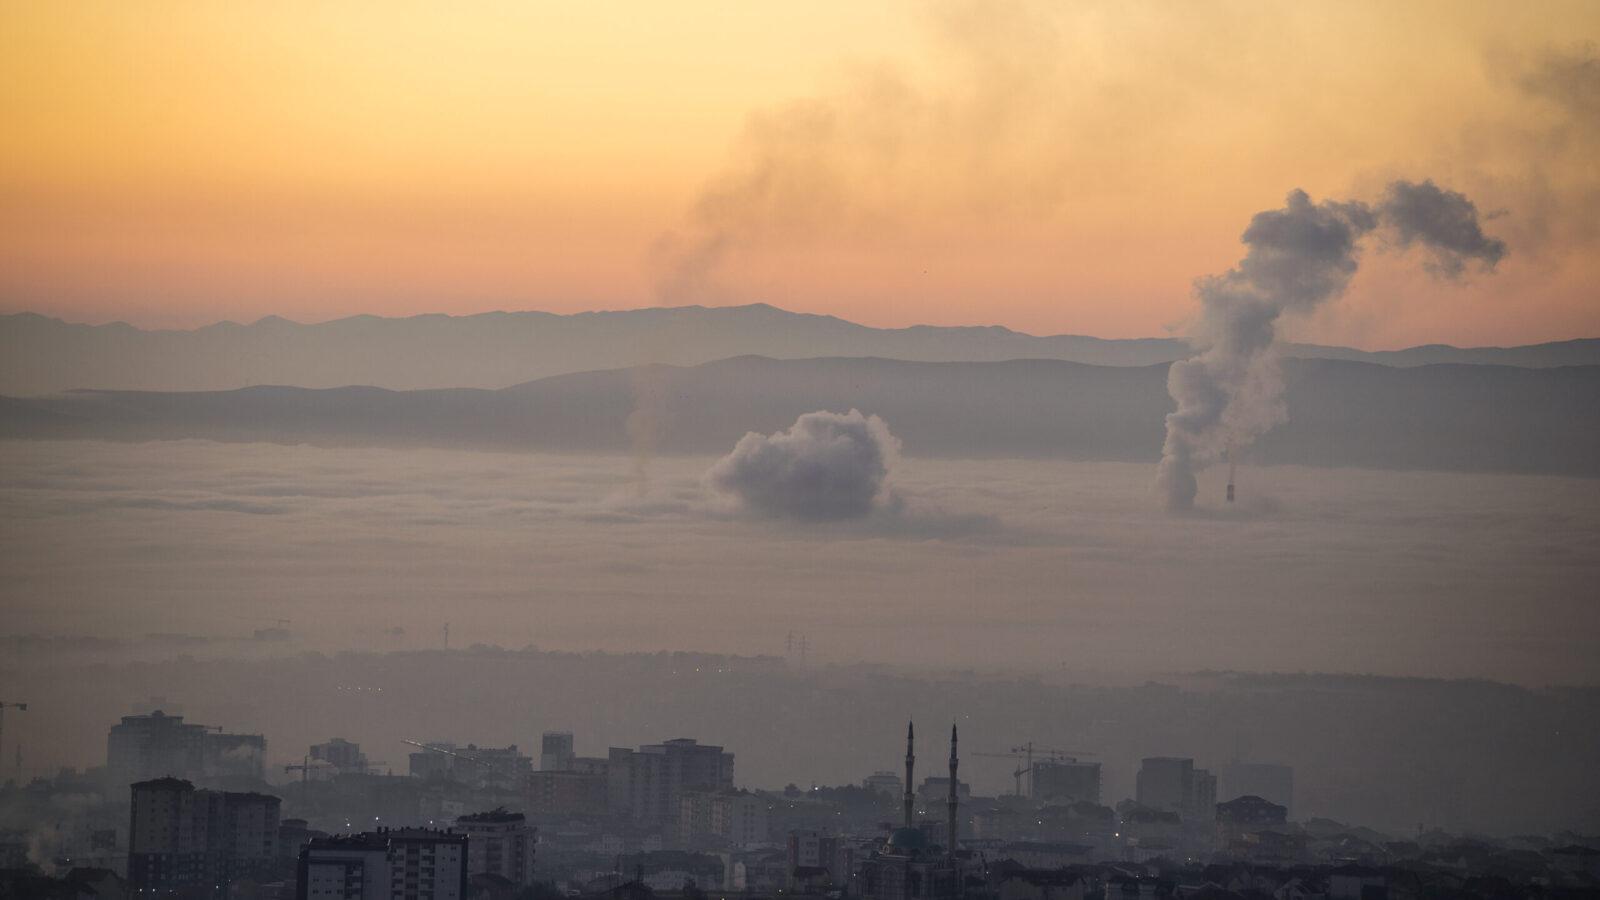 Coal power plants near Prishtina in Kosovo_Credit Arben Llapashtica